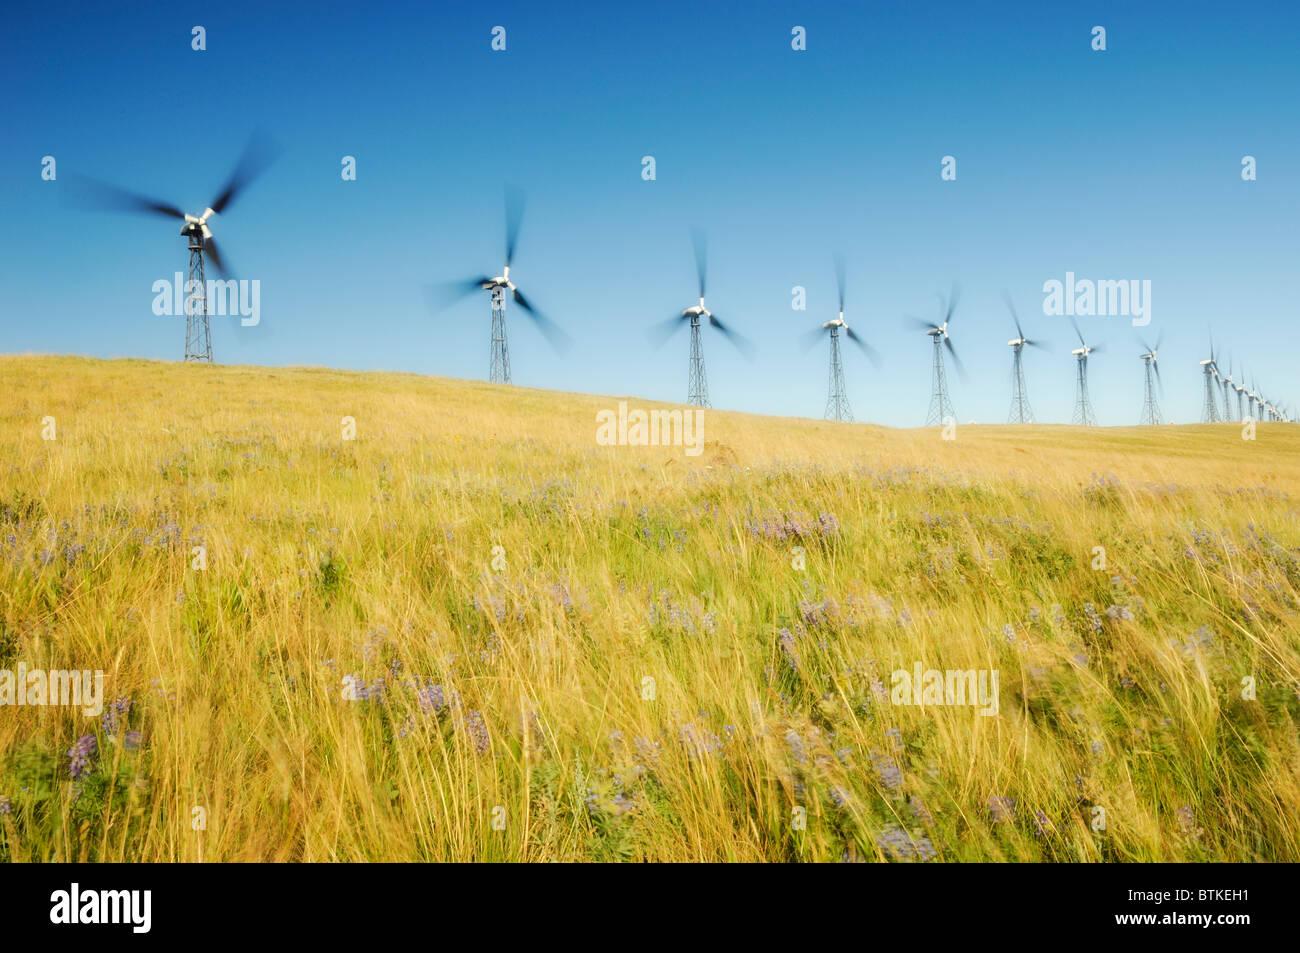 Windmills - Pincher Creek, Alberta, Canada - Stock Image